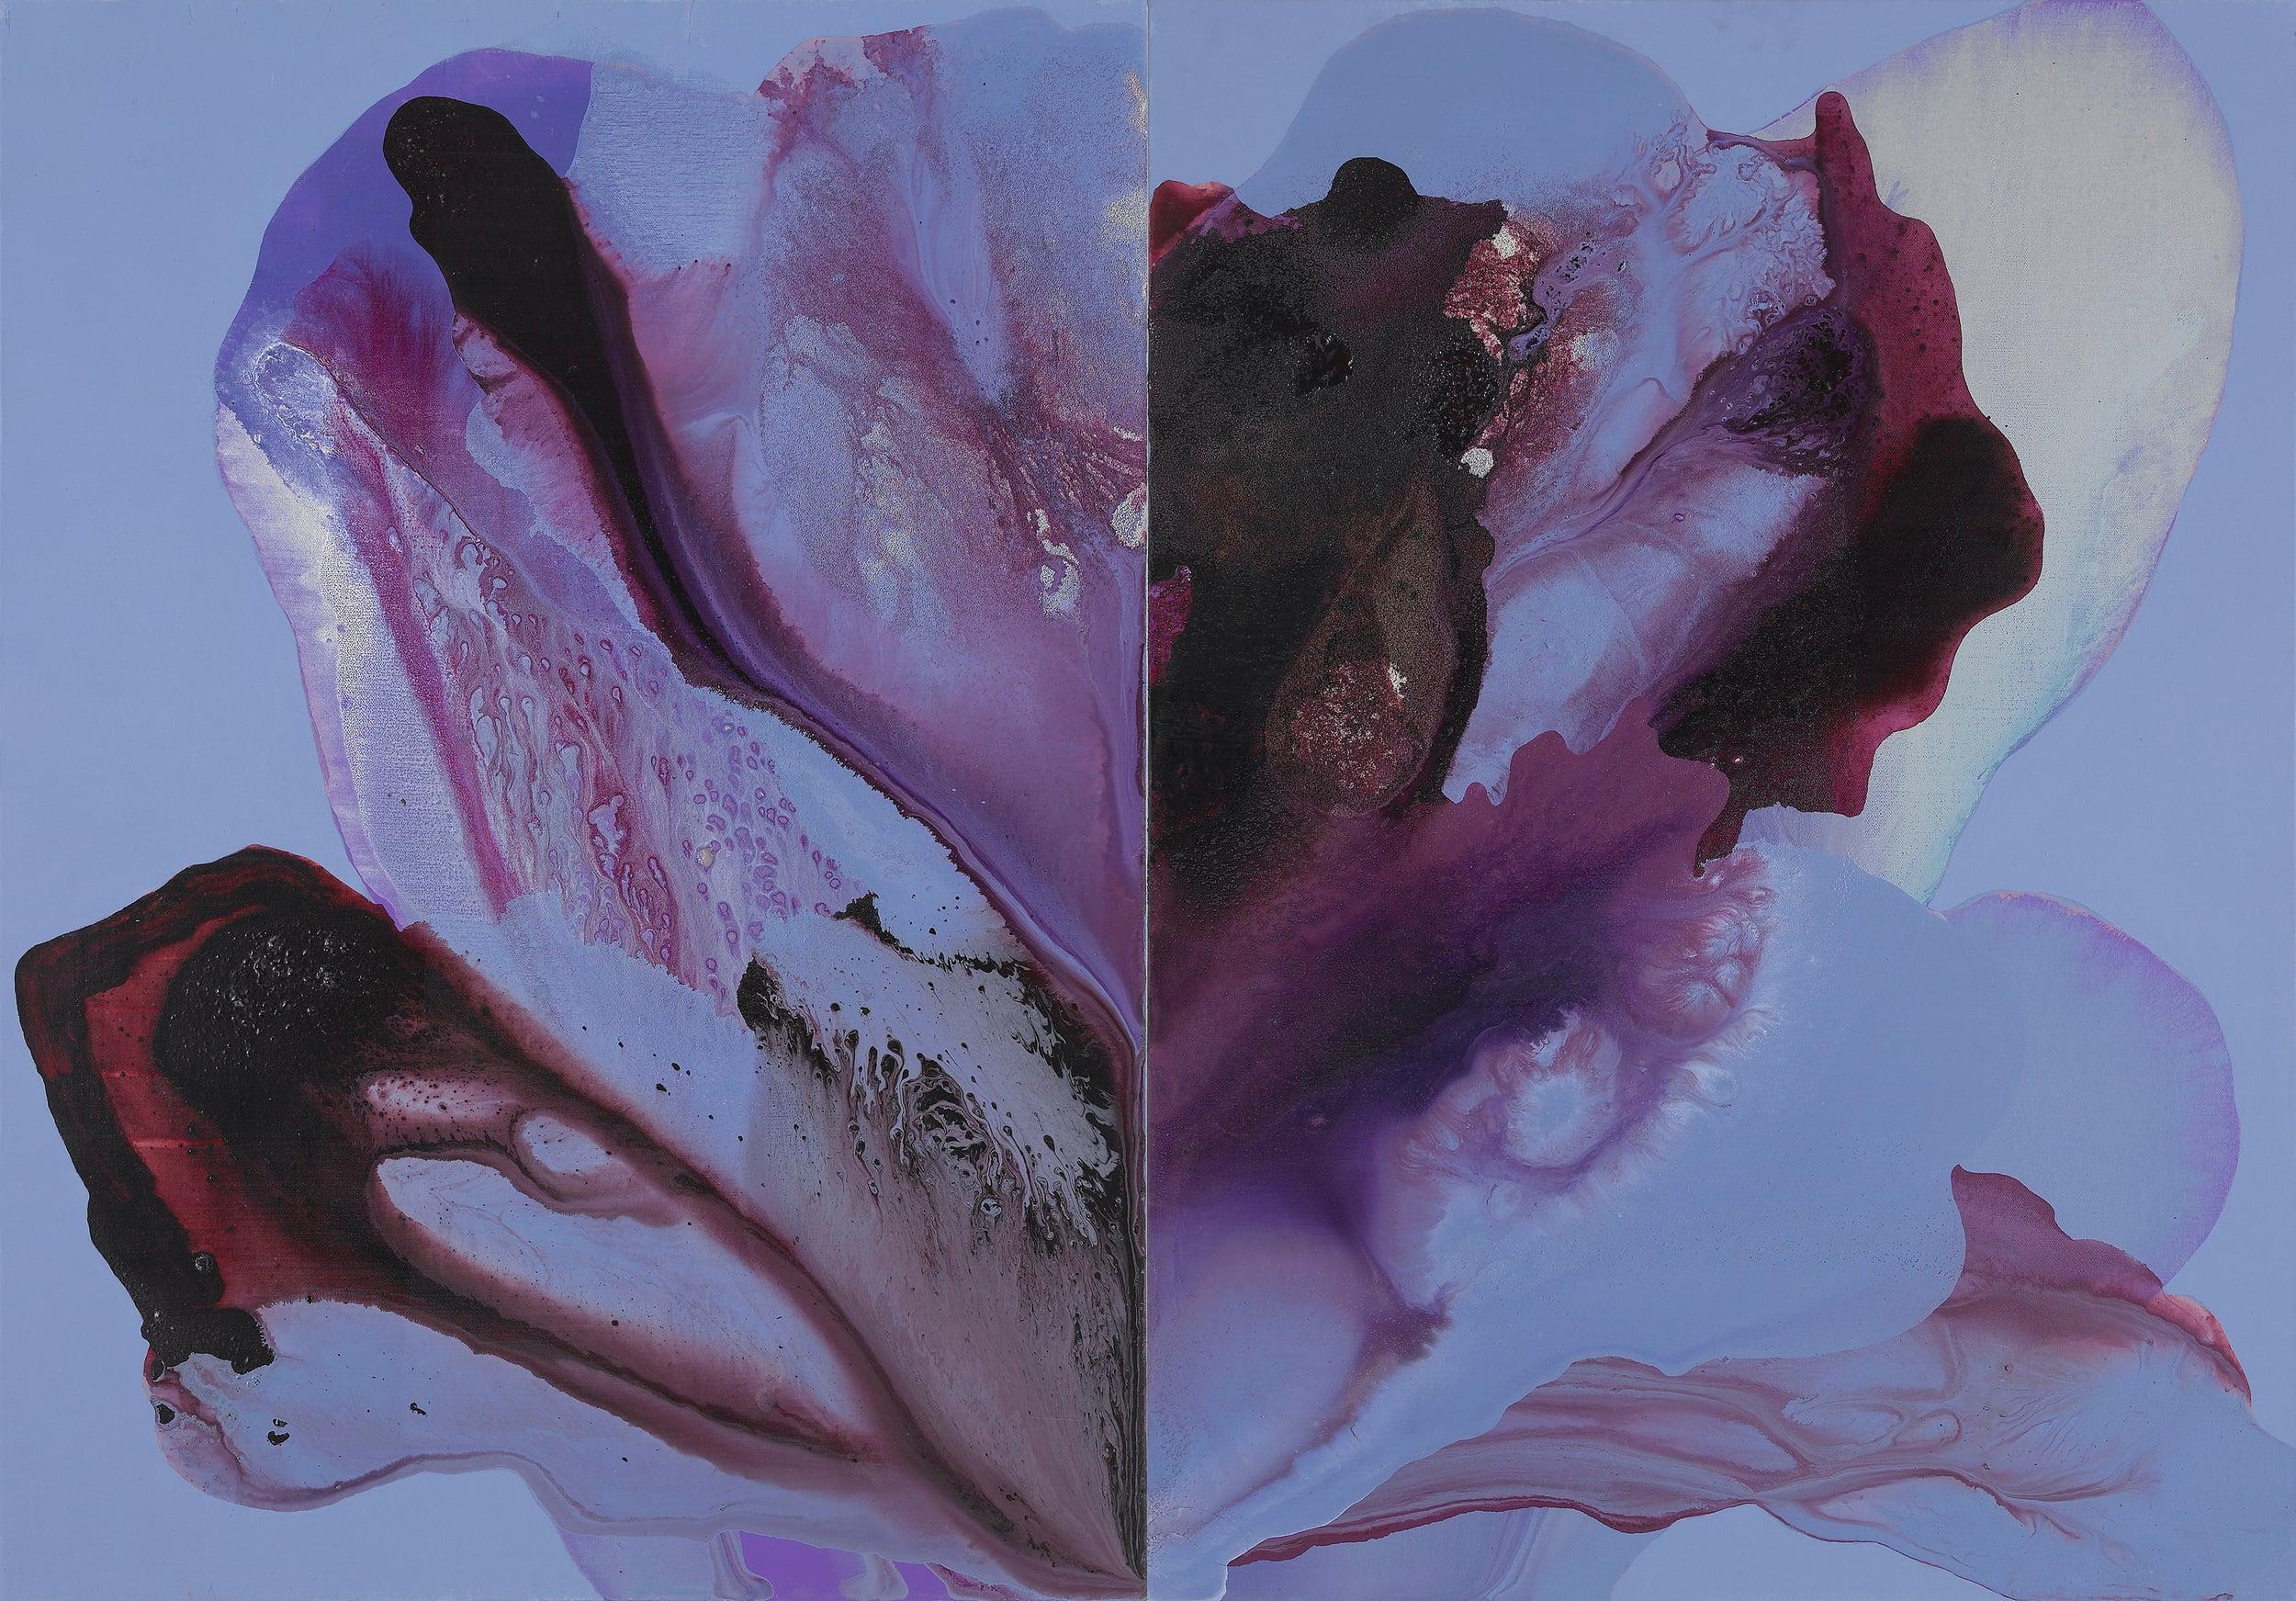 figure_08  acrylic and pumice  gel on canvas  132 cm X 92 cm  2013